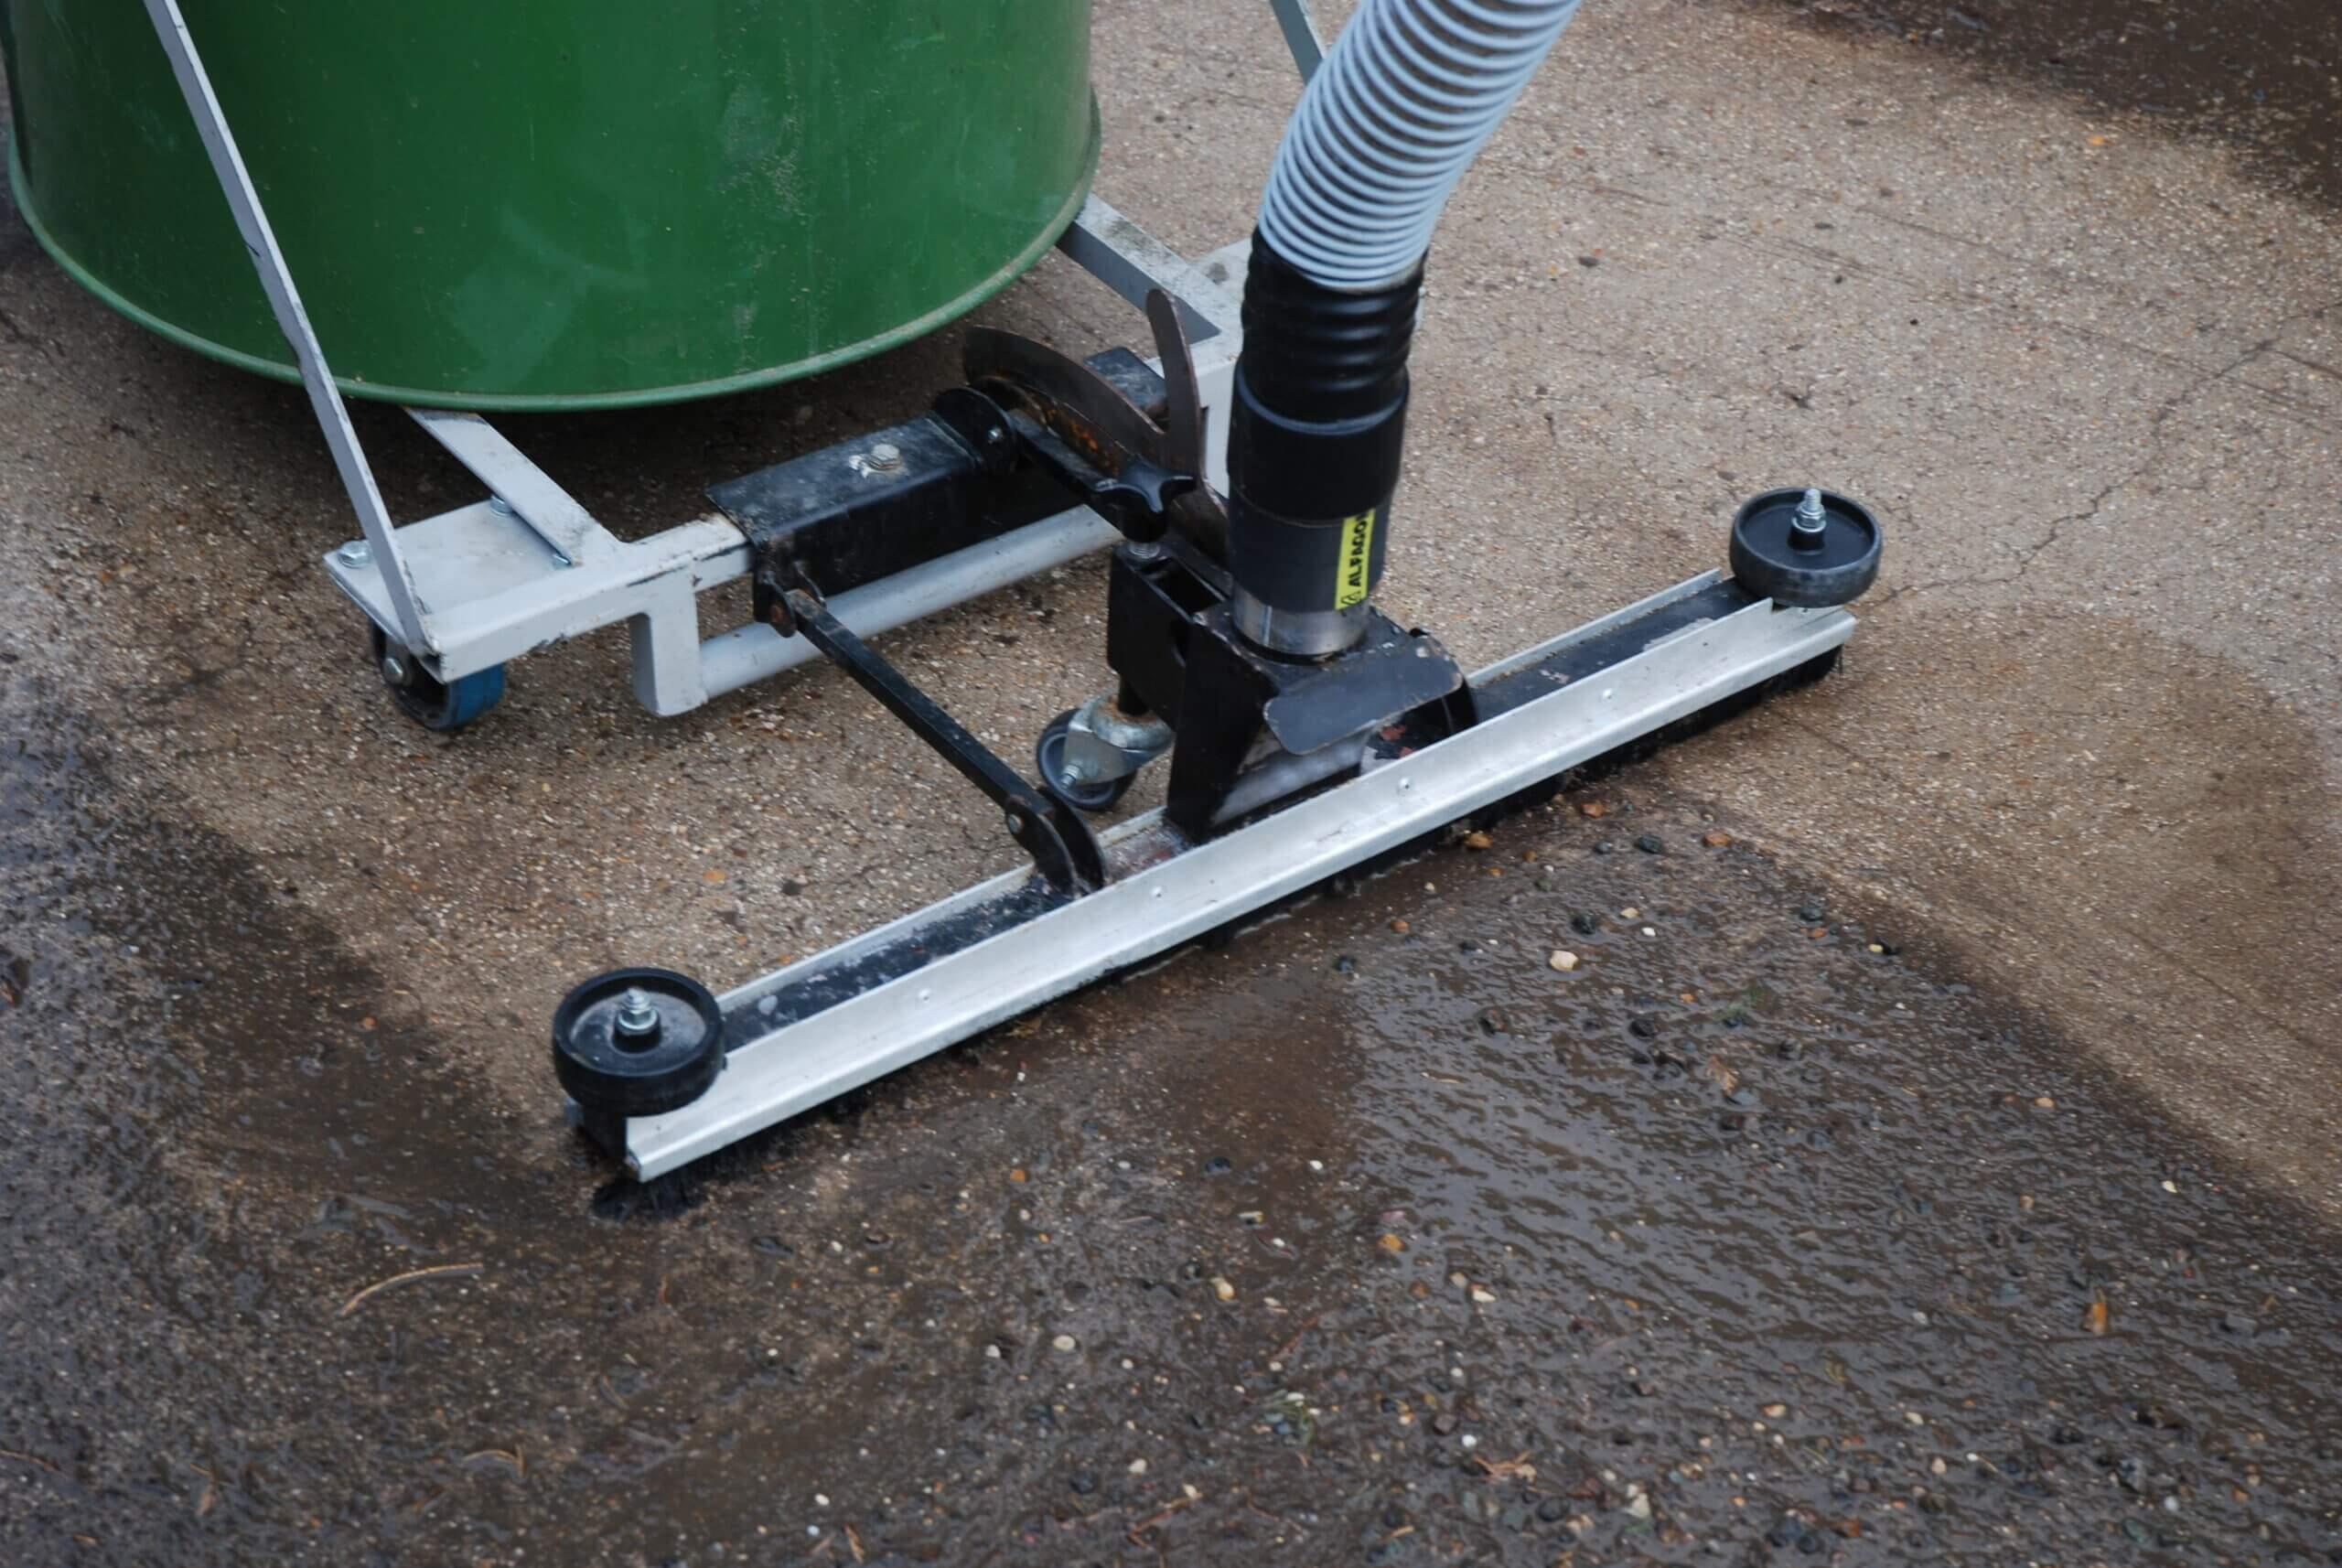 Big Brute Wet & Dry Floor Squeegee Cleaning A Wet Floor